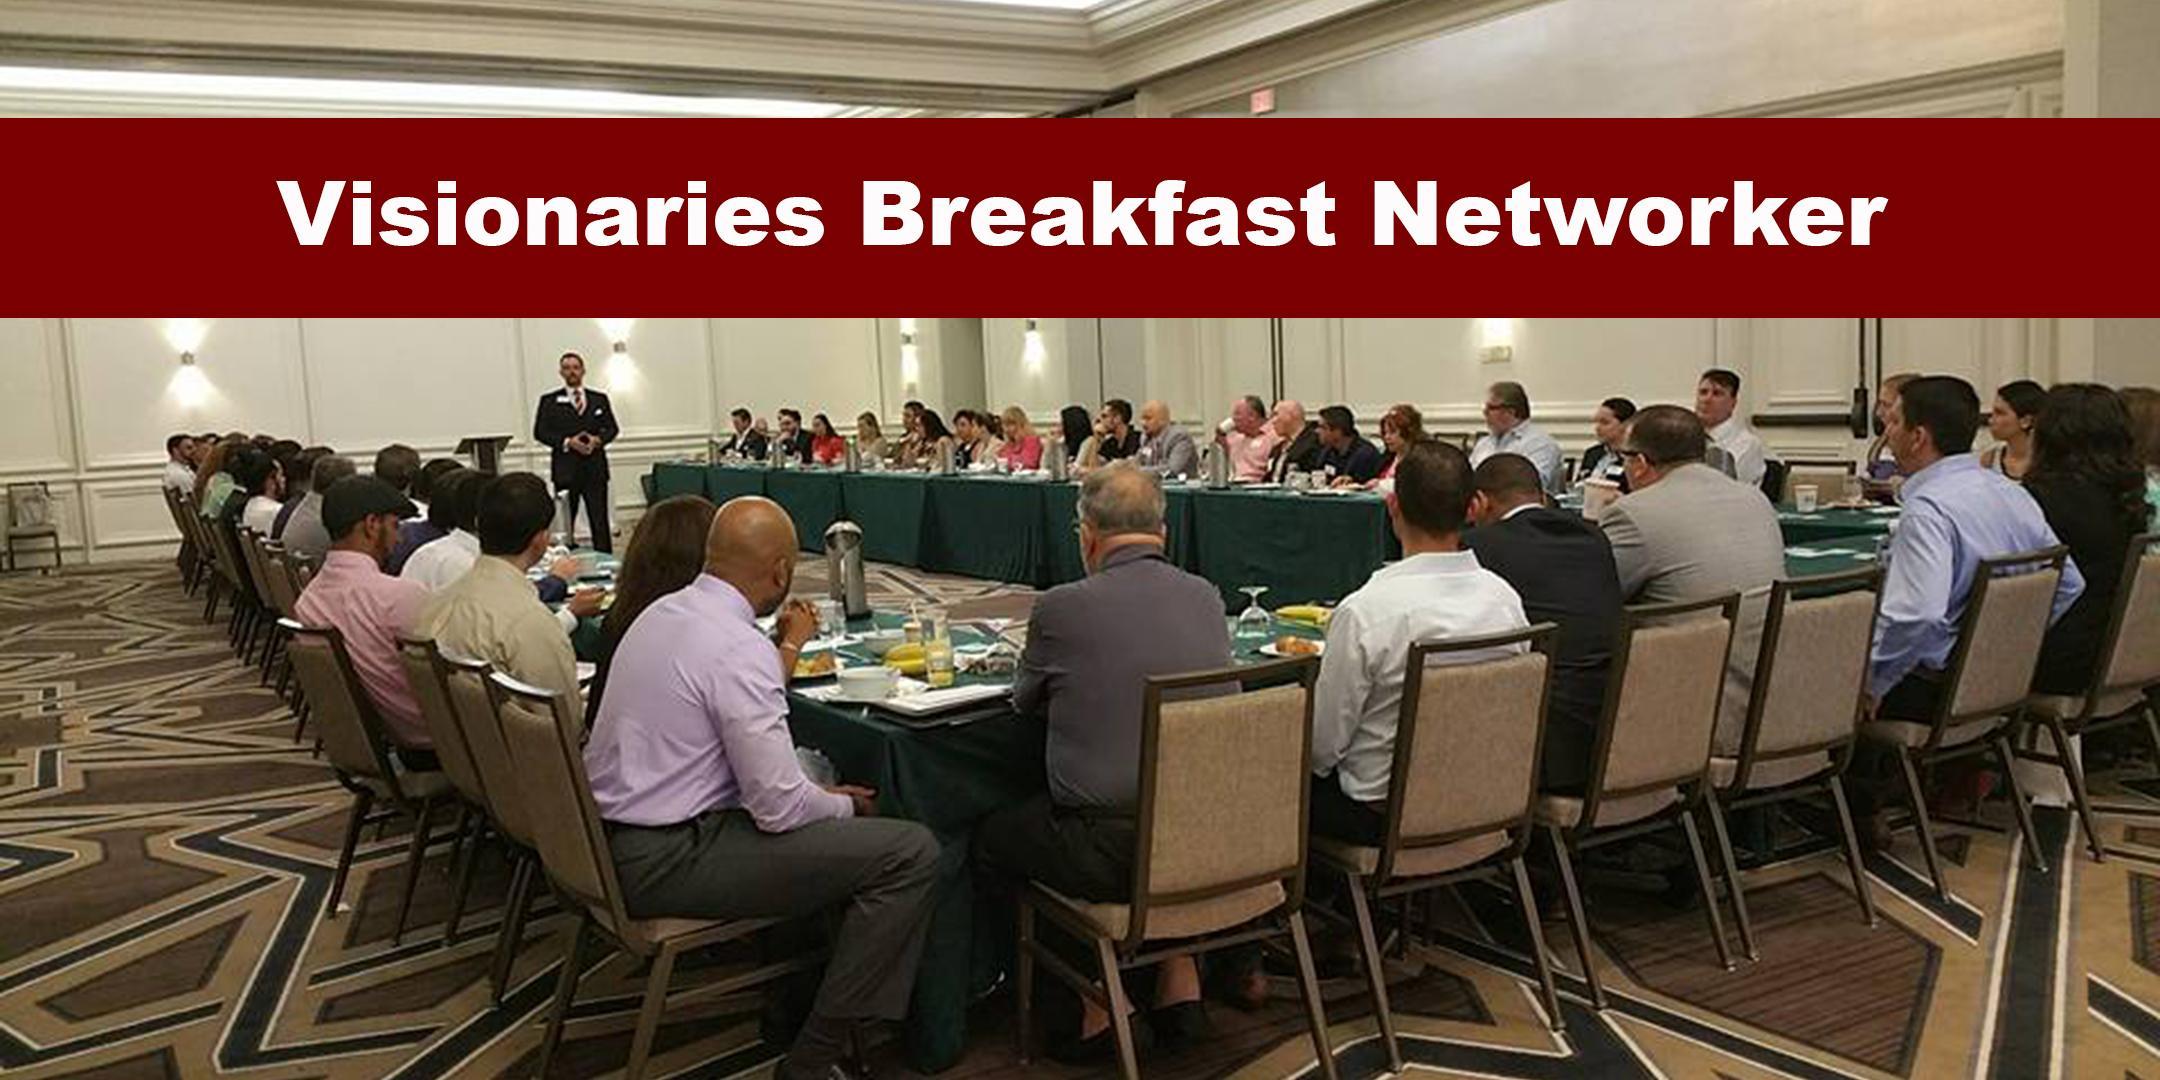 BNI Vision Breakfast Networker